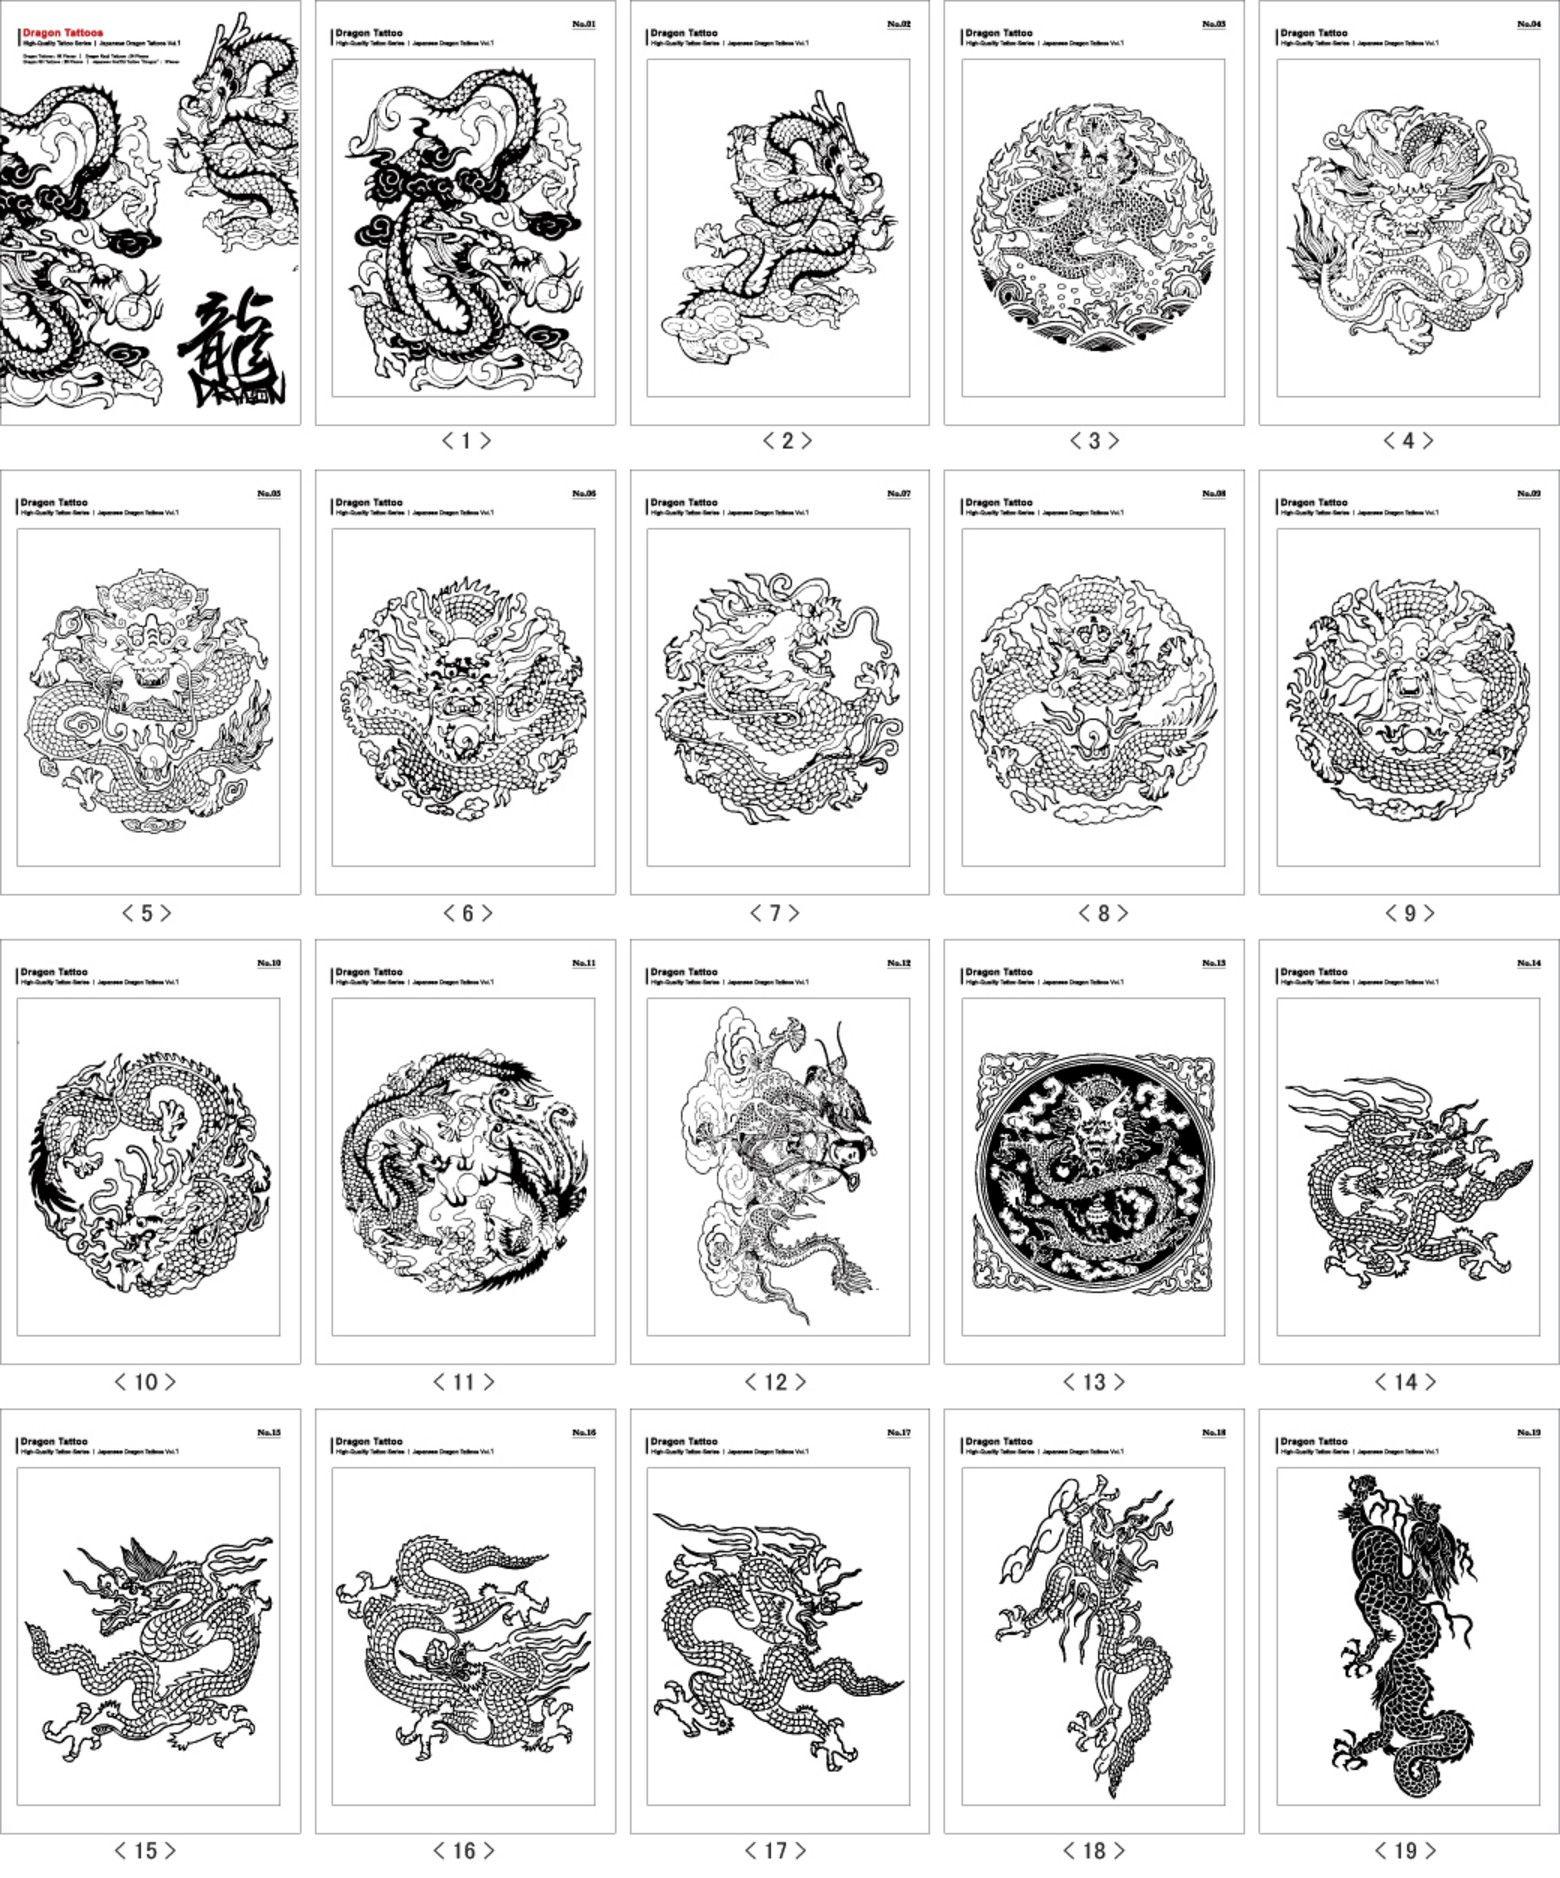 45 amazing japanese tattoo designs tattoo easily - Japanese Tattoo Meanings